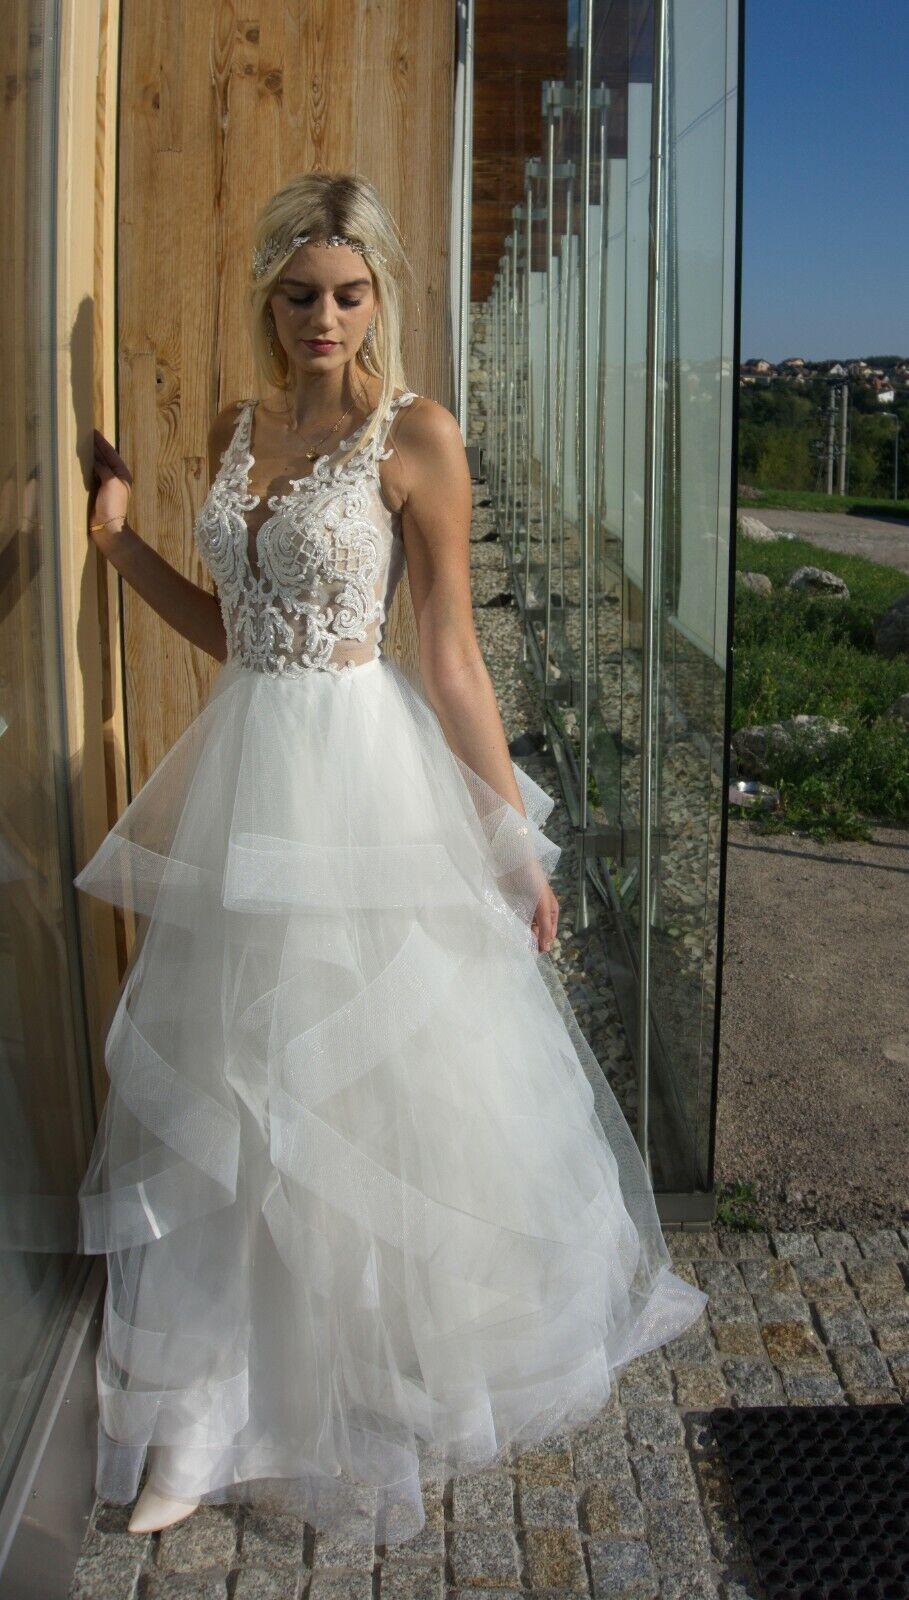 CITAL Wedding Dress Laces Polish Product HANDMADE